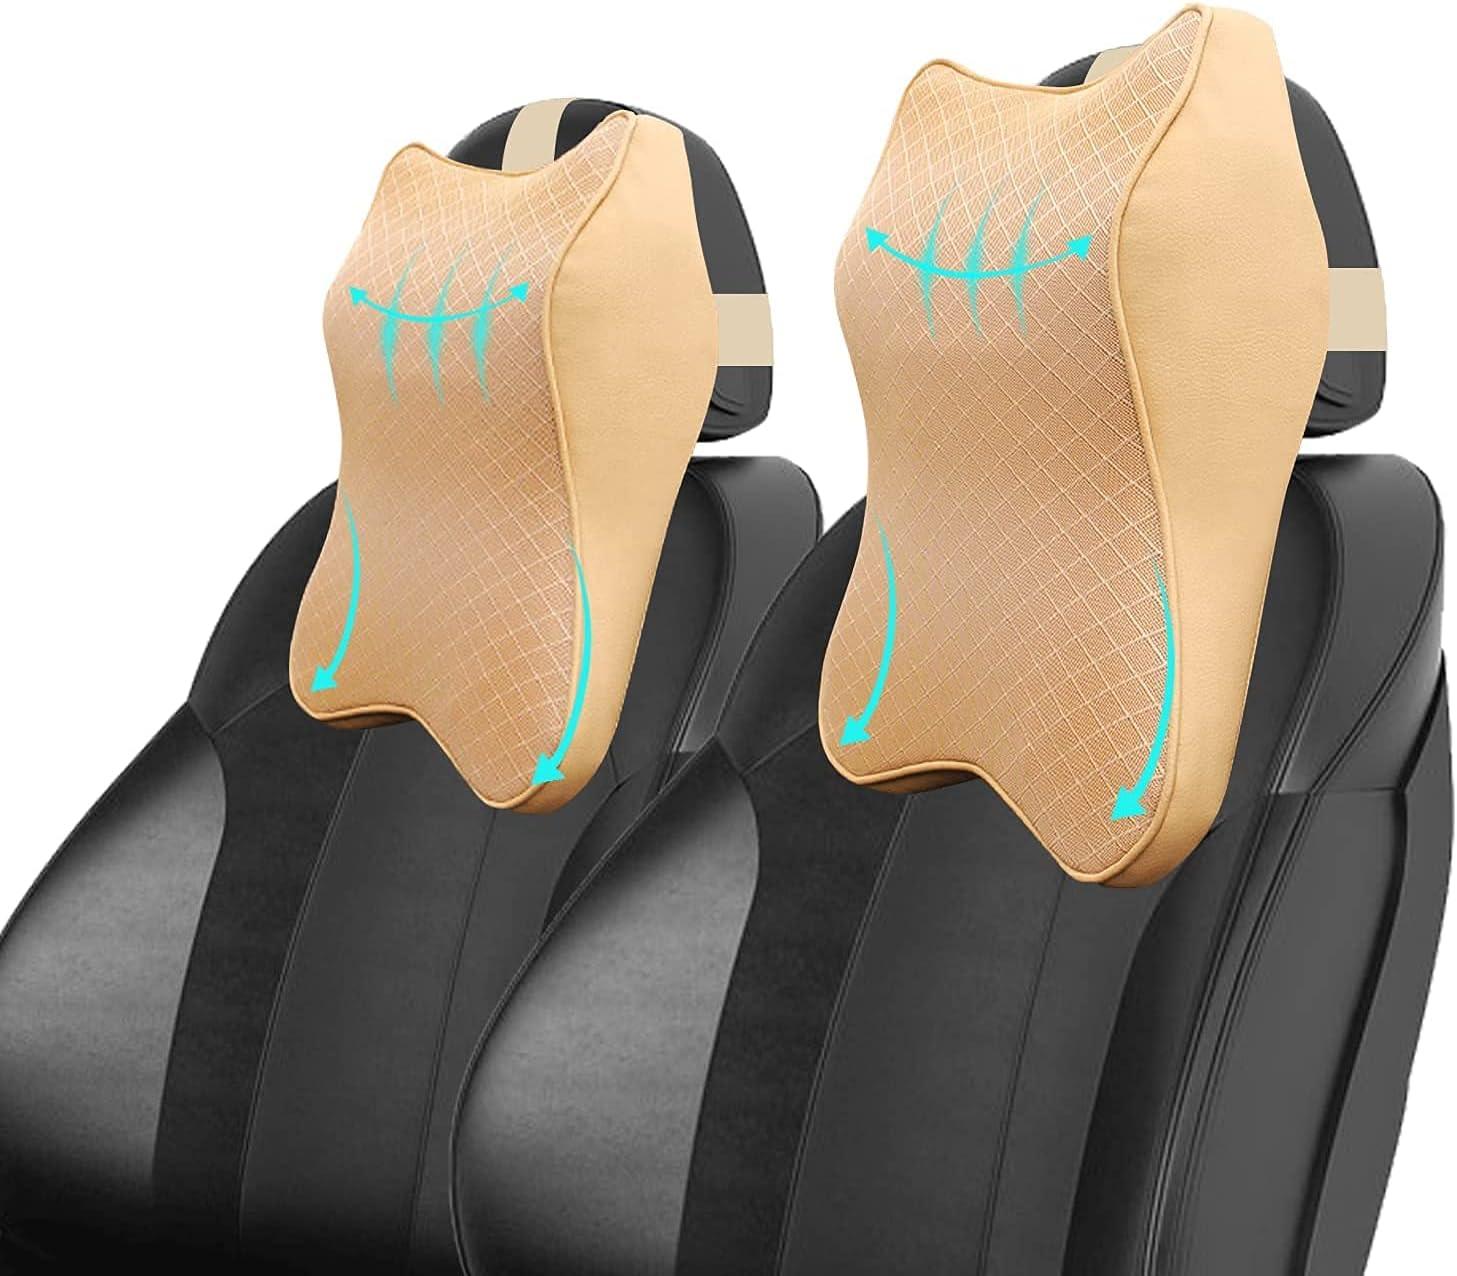 Greendhat 2Pcs Car Neck Pillows 1 Pillow Ergonomic Headrest Max Selling 52% OFF